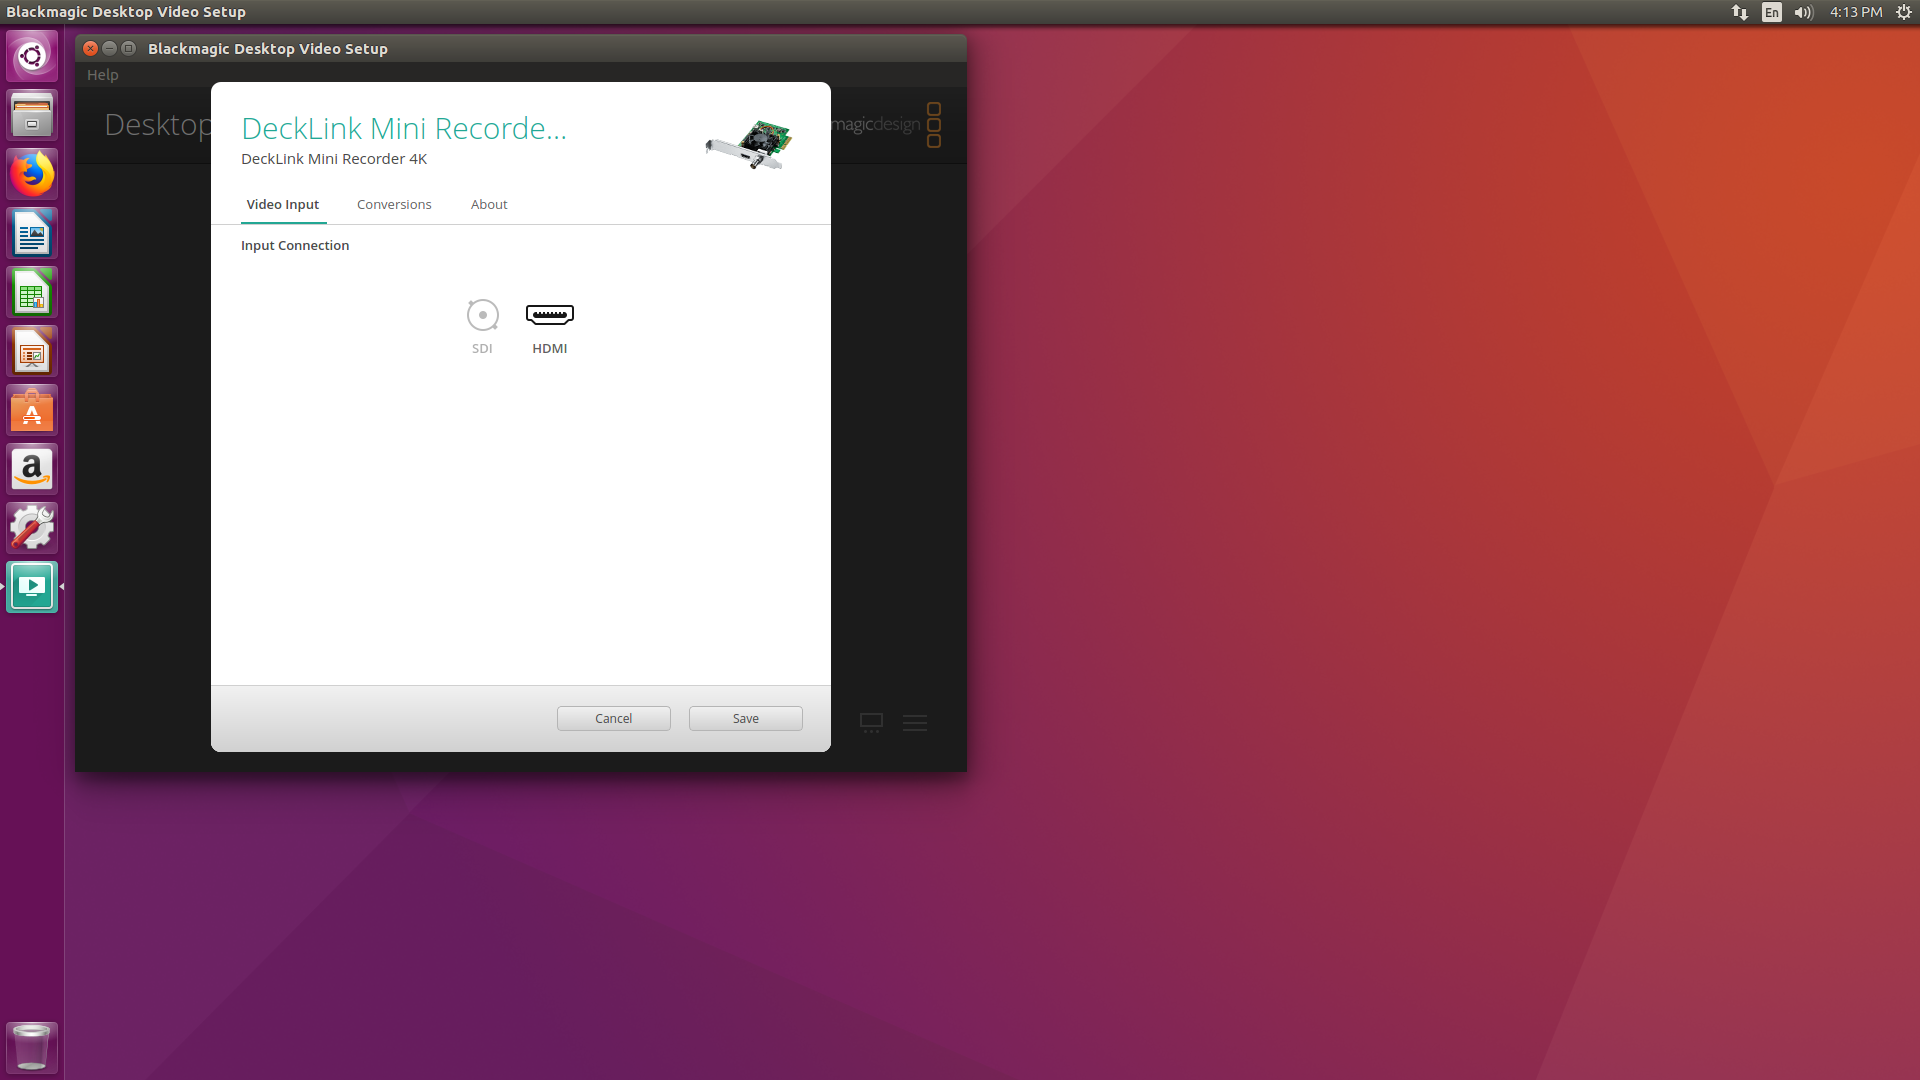 Desktop Video Input